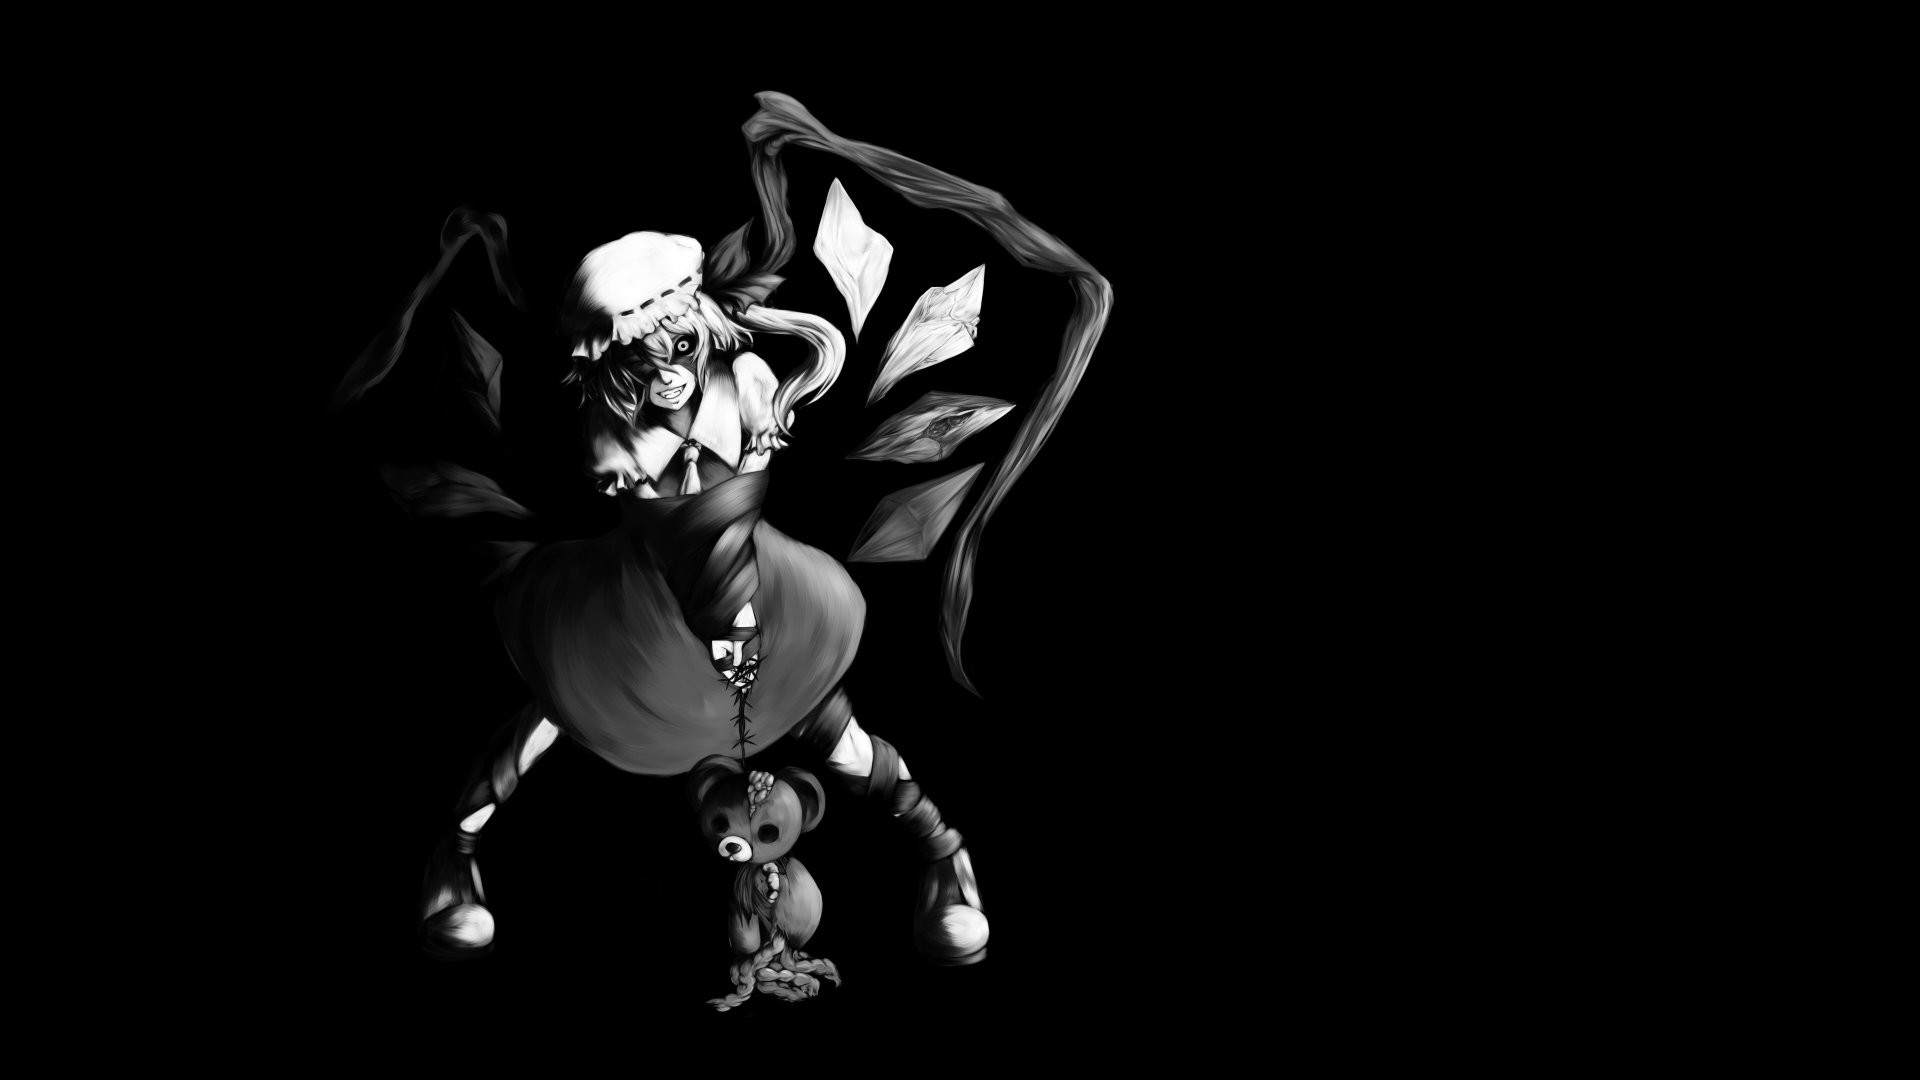 black and white video games Touhou wings black dark dress long hair  vampires crystals stuffed animals